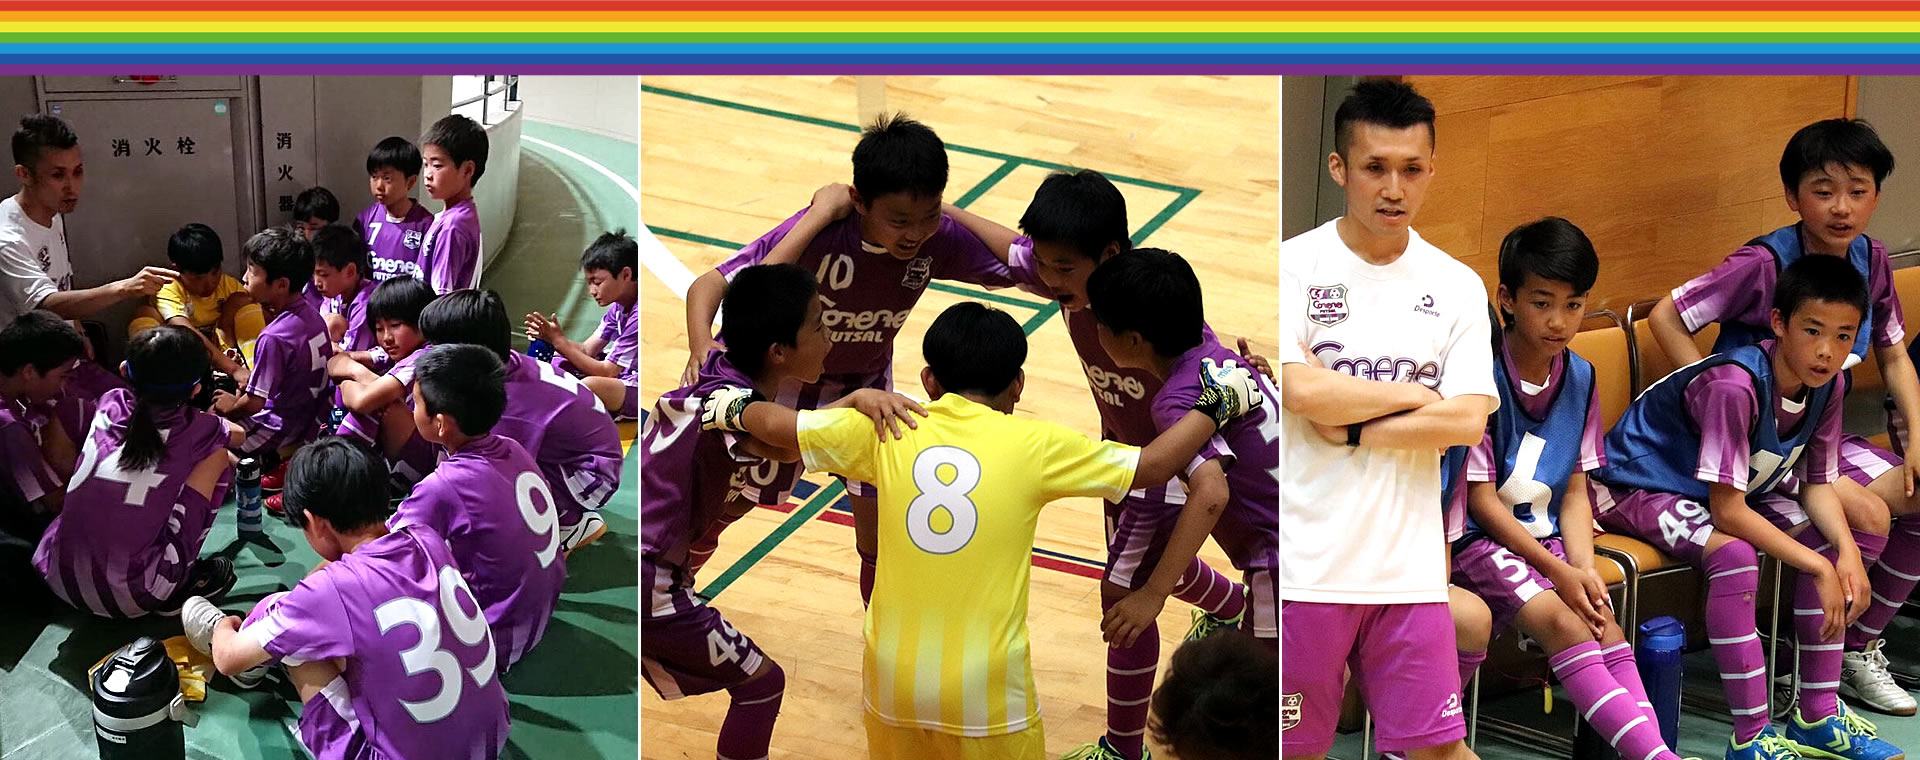 Contente(コンテンテ)/東京都青梅市/幼稚園・小学生・中学生対象のフットサル・サッカーチーム